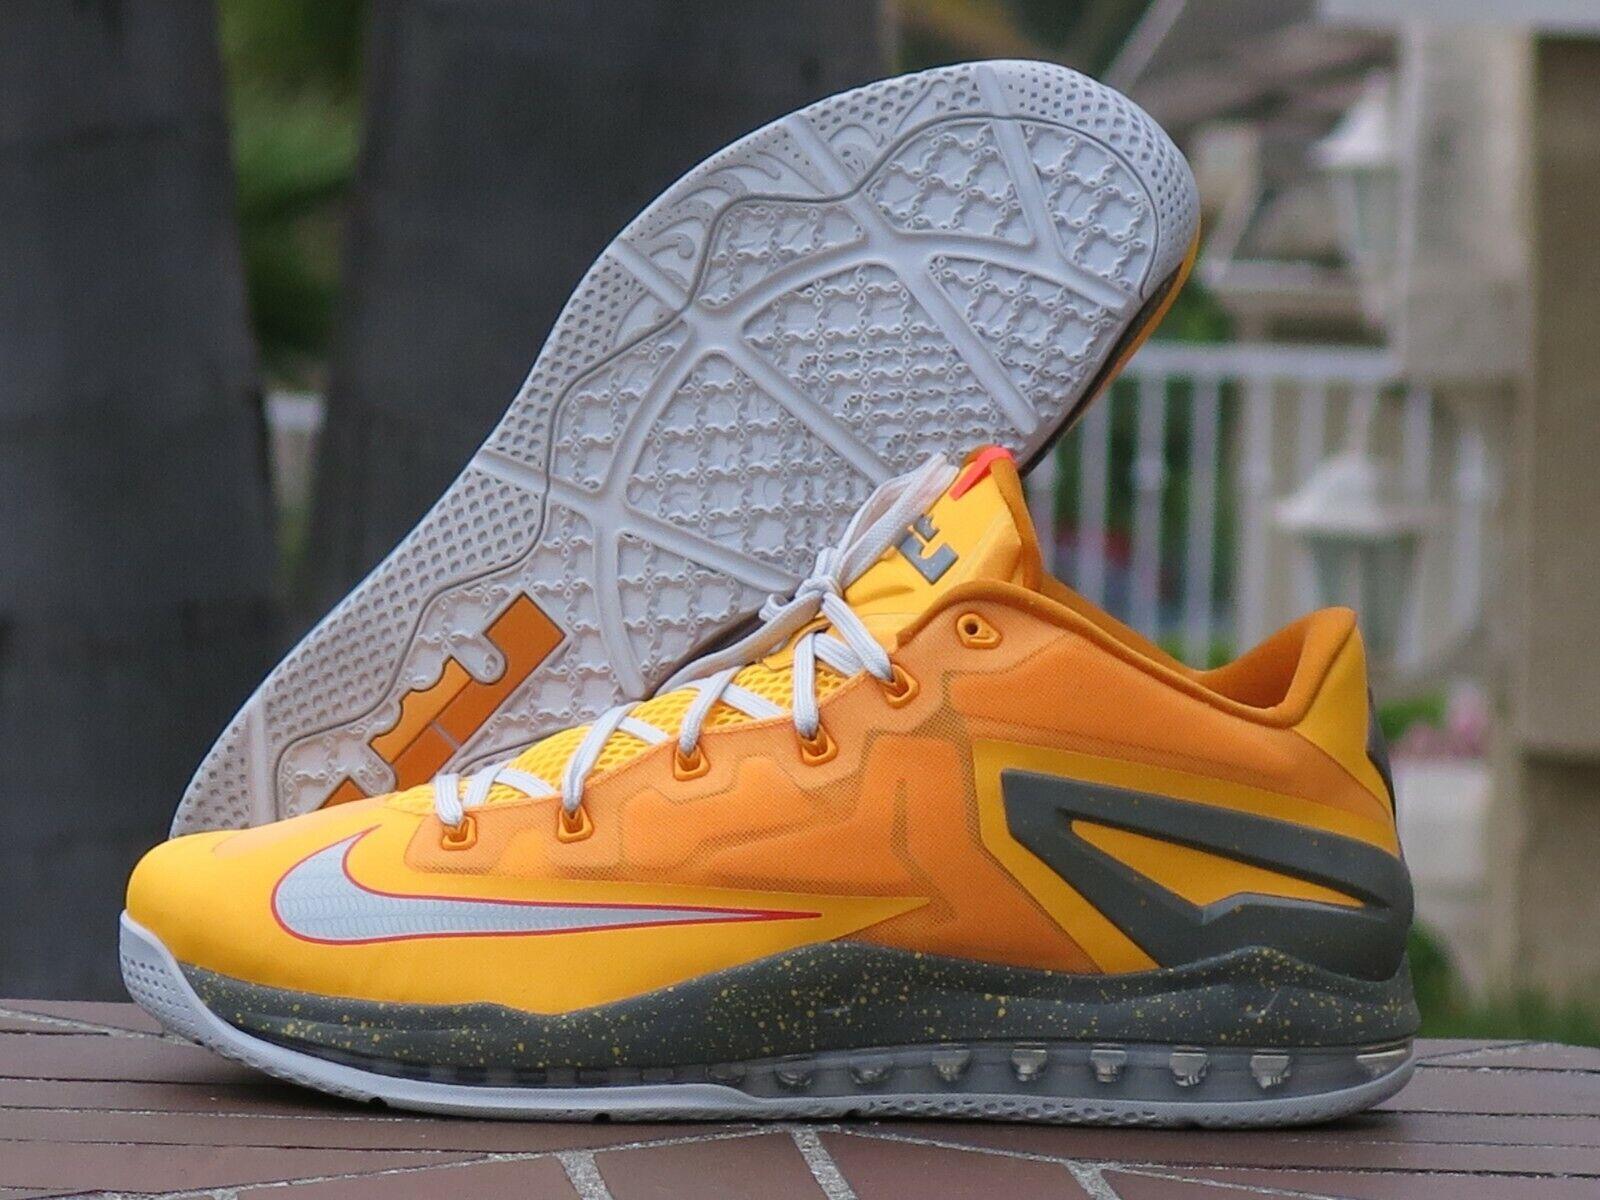 Nike Lebron XI 11 Low Men's Basketball shoes 642849-800